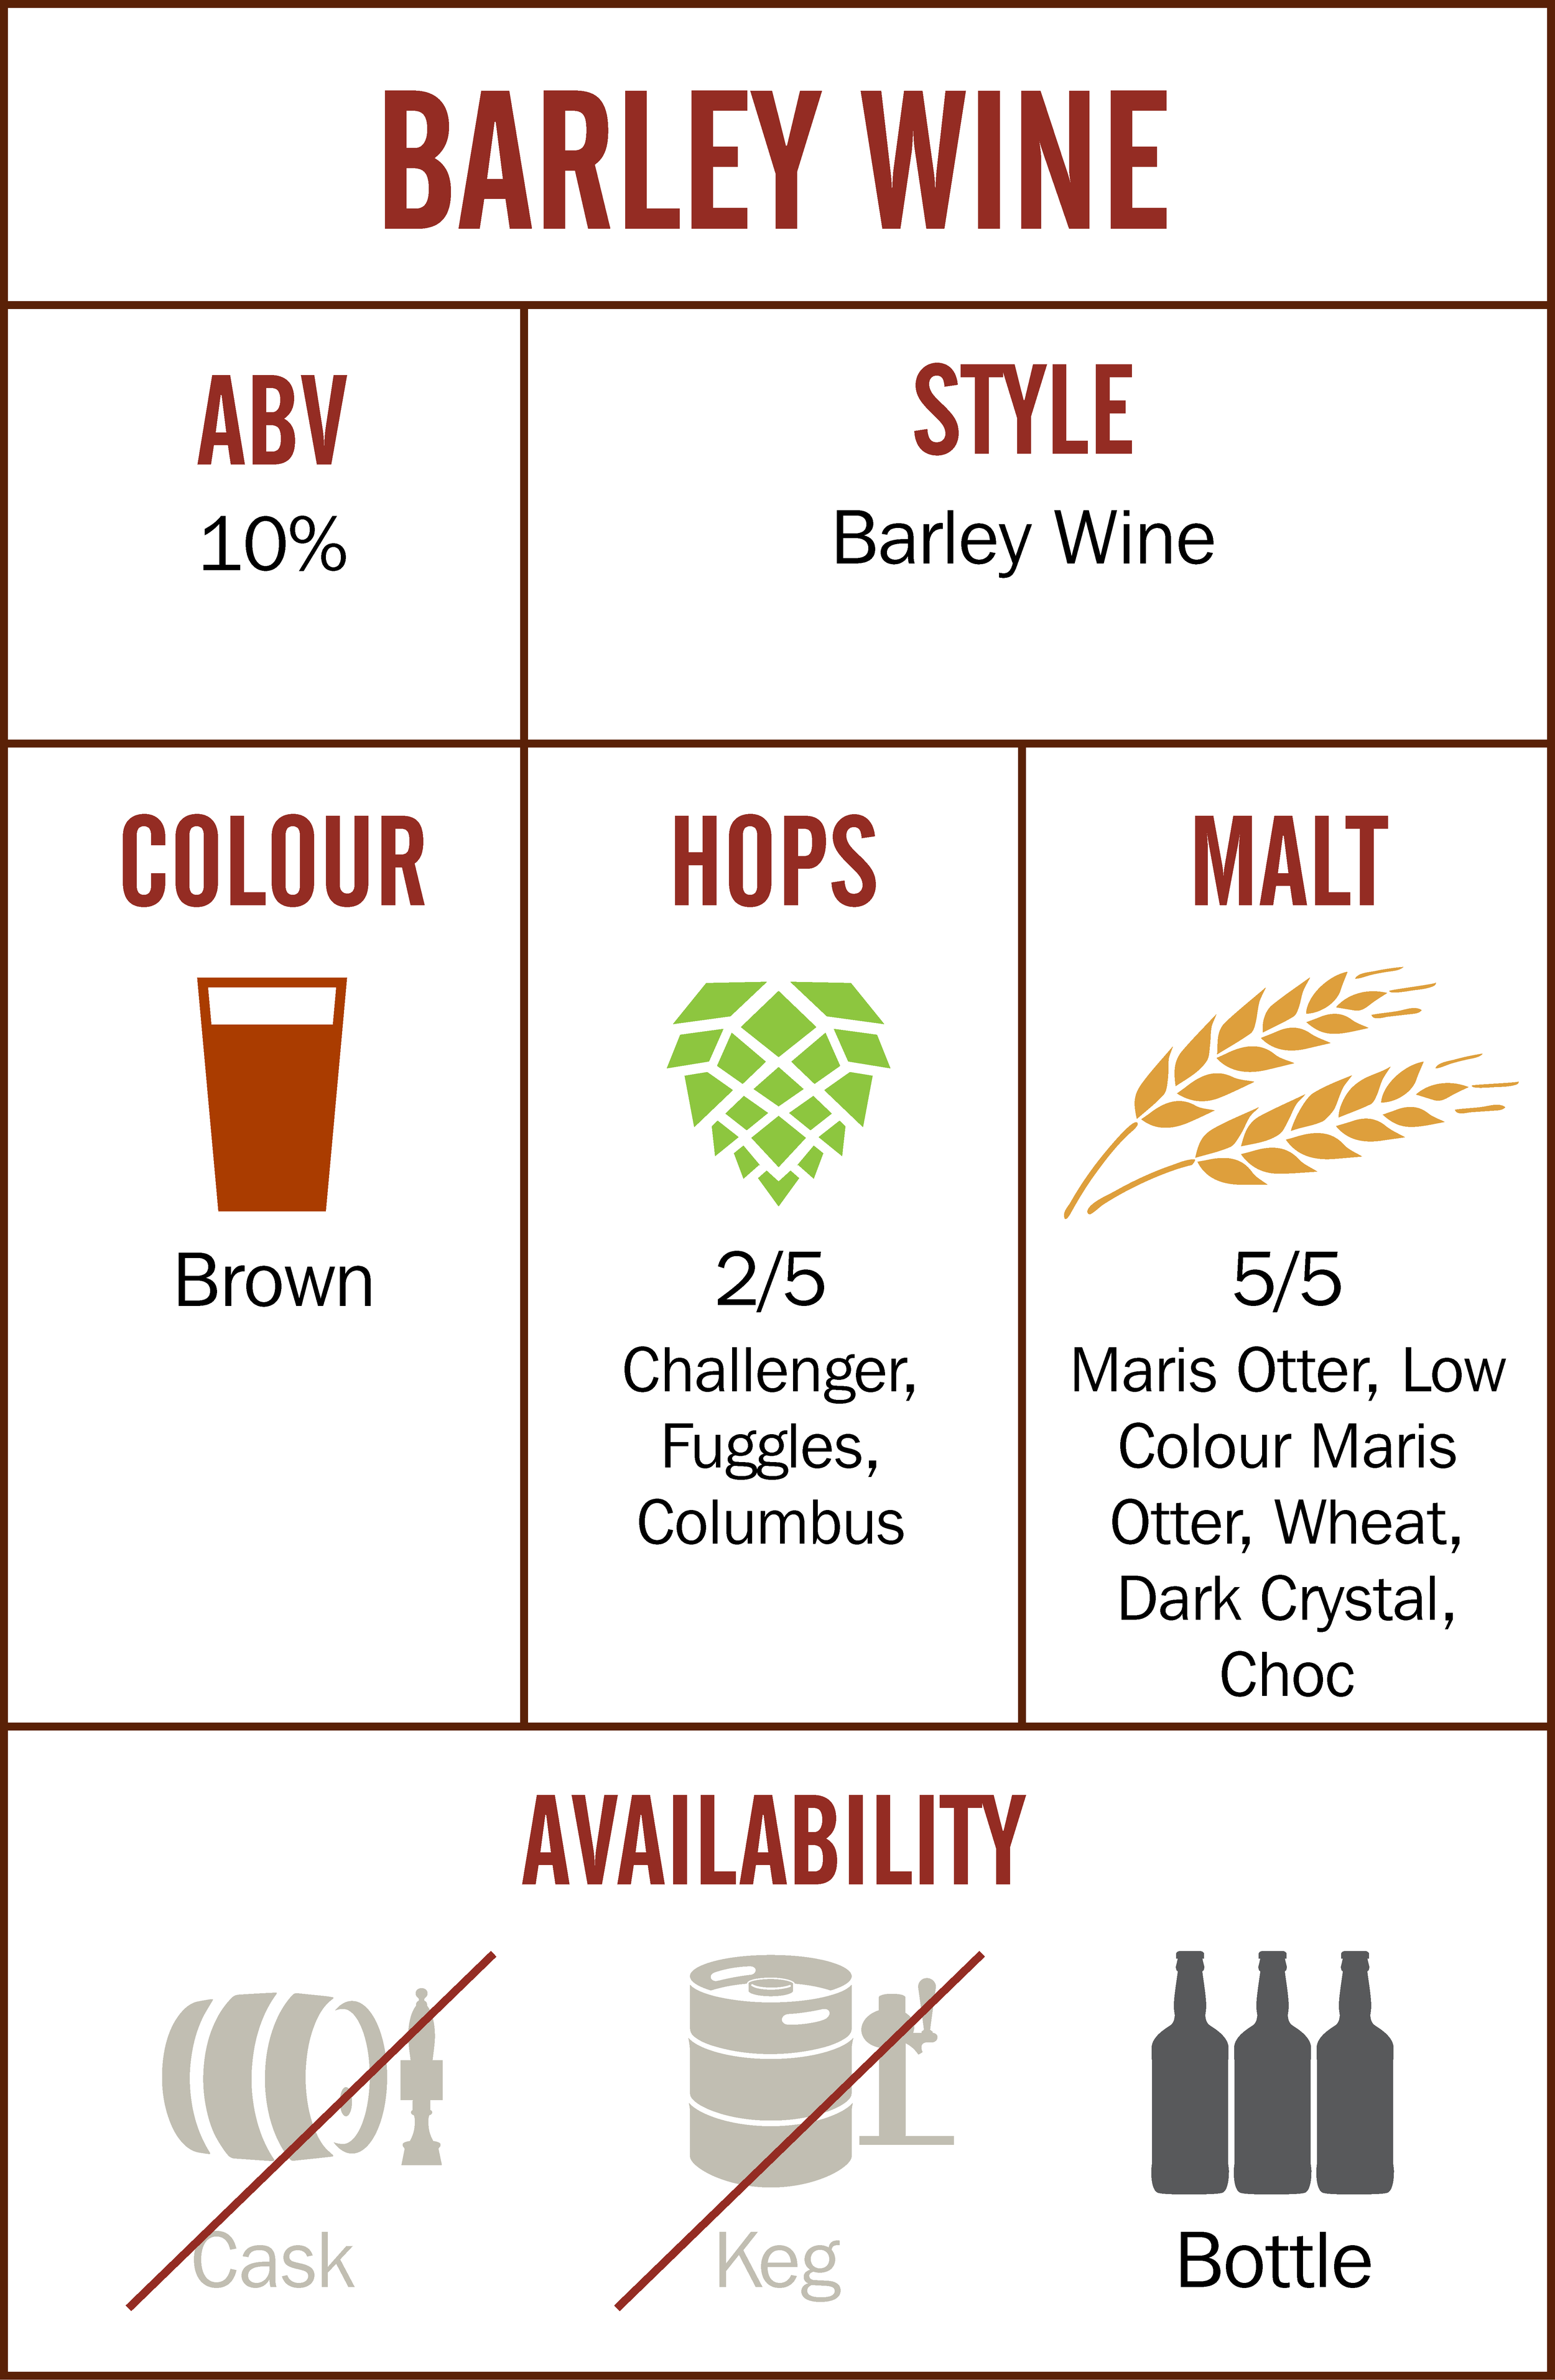 BBF Barley Wine